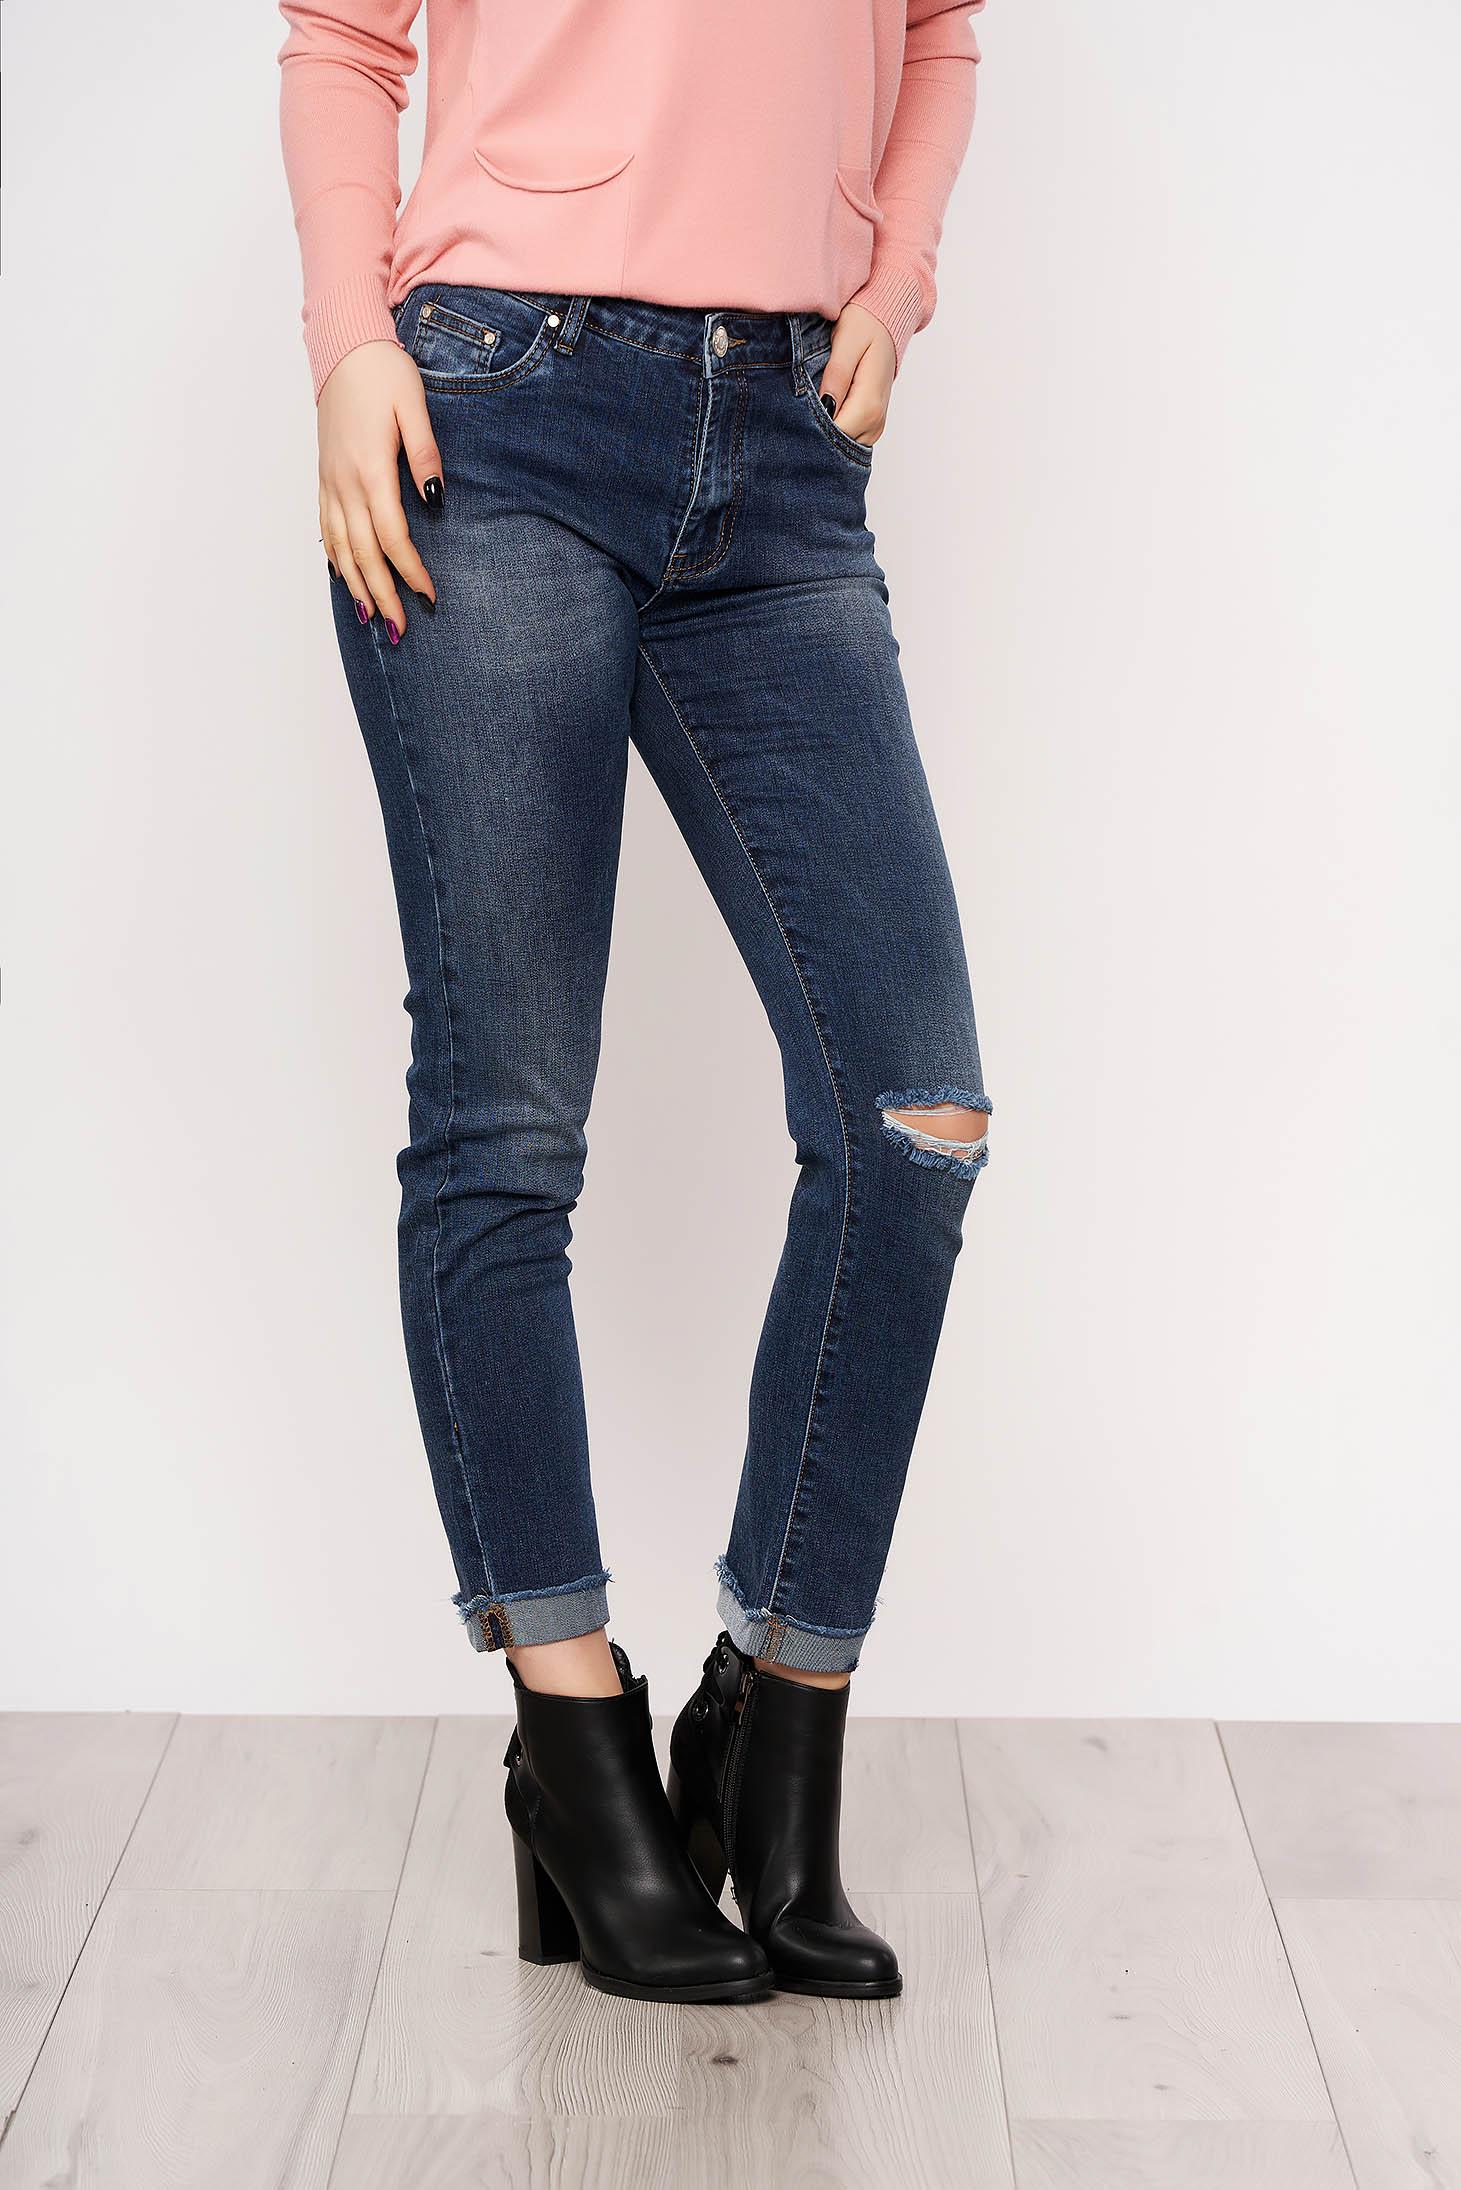 Blue skinny jeans jeans medium waist slightly elastic cotton